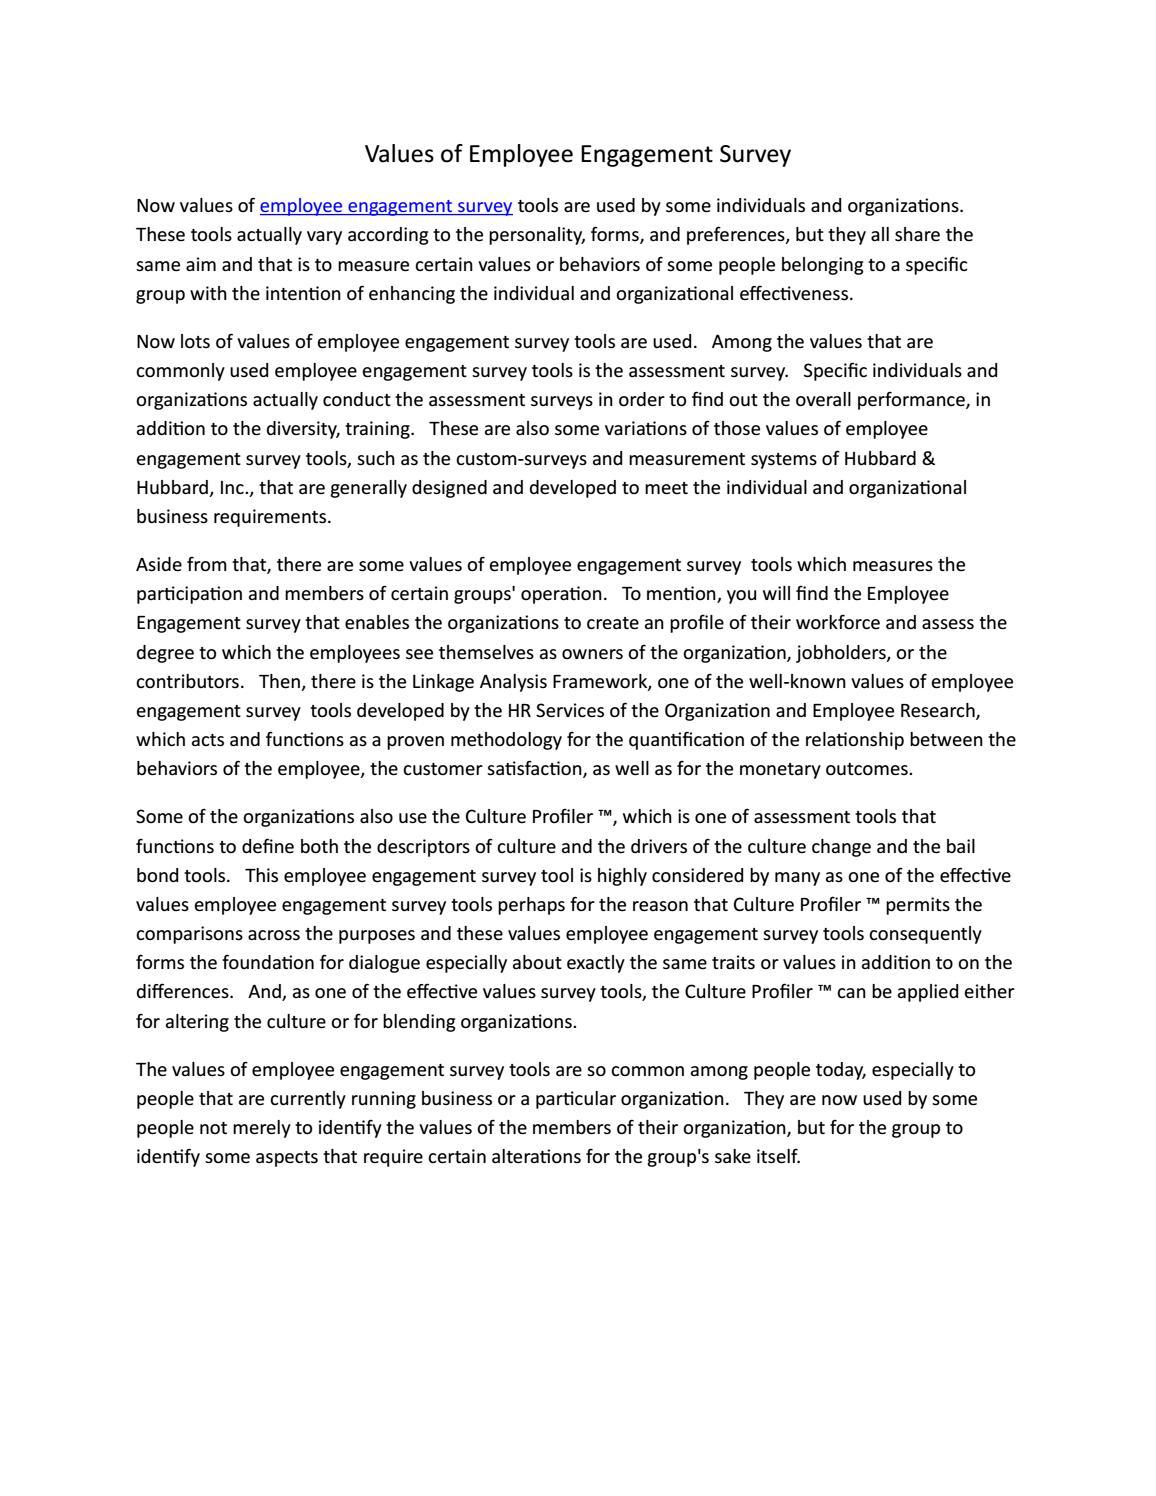 phd dissertation defense help analysis of an advertisement essay images